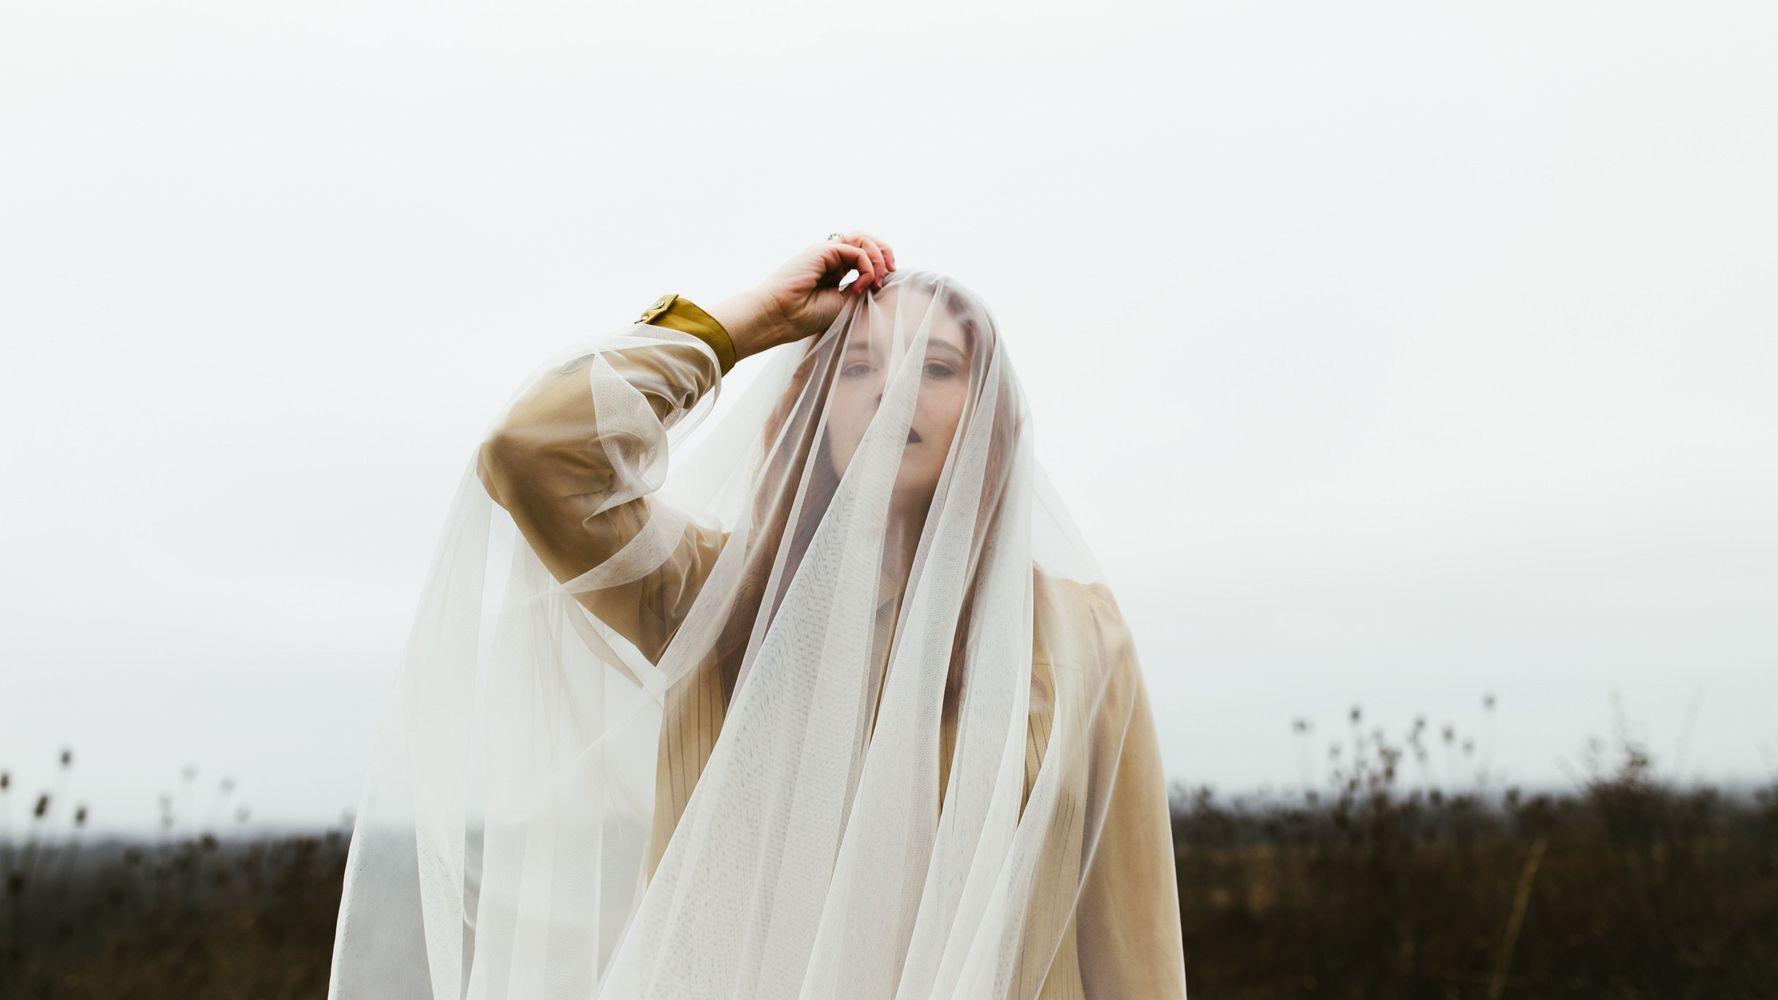 Spiritual Hijackers: The New Age Narcissist | HuffPost